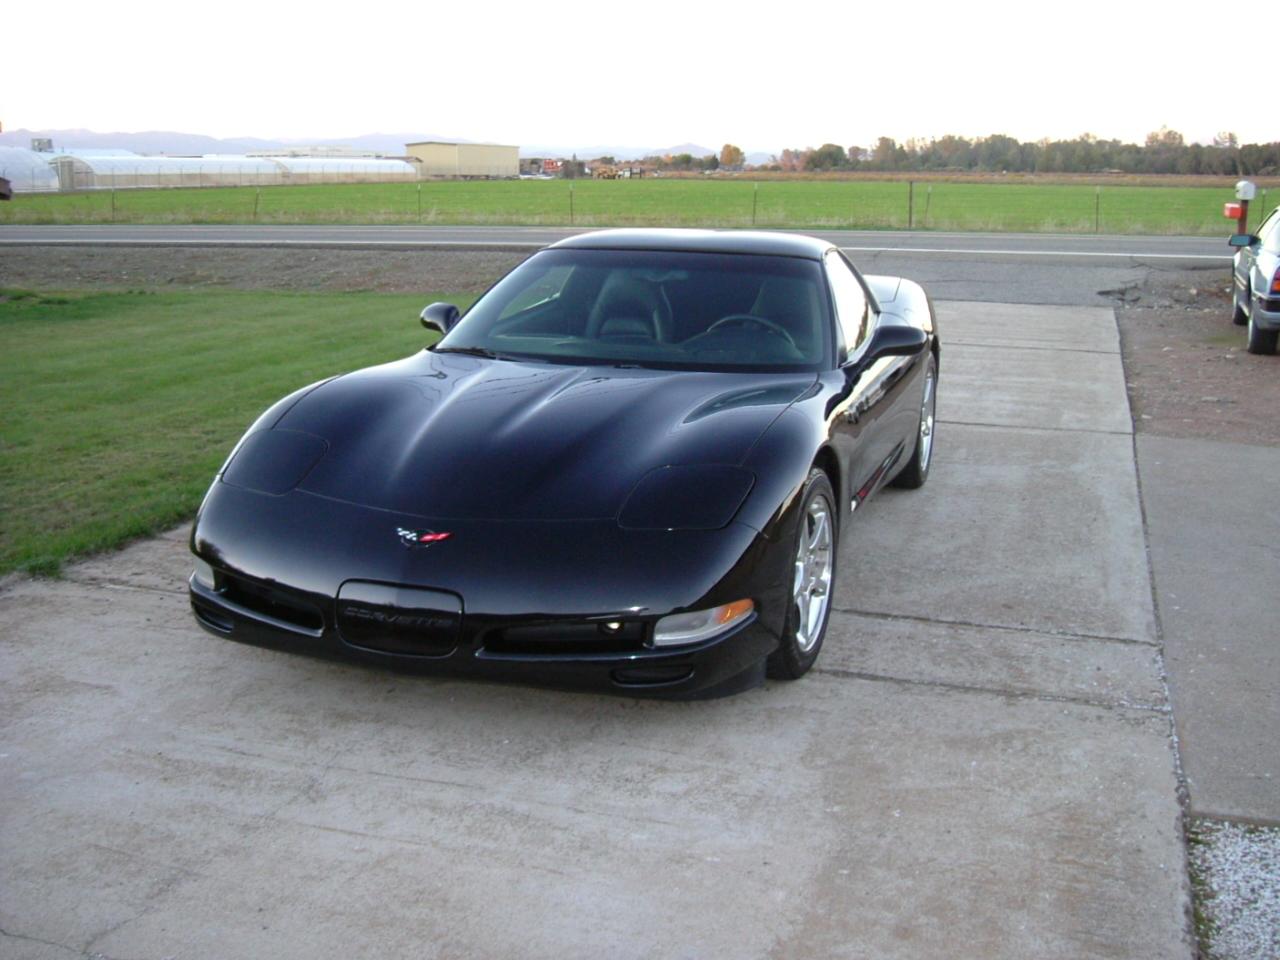 Kia Optima fuel mileage on long trip.-2010_1115image00013.jpg